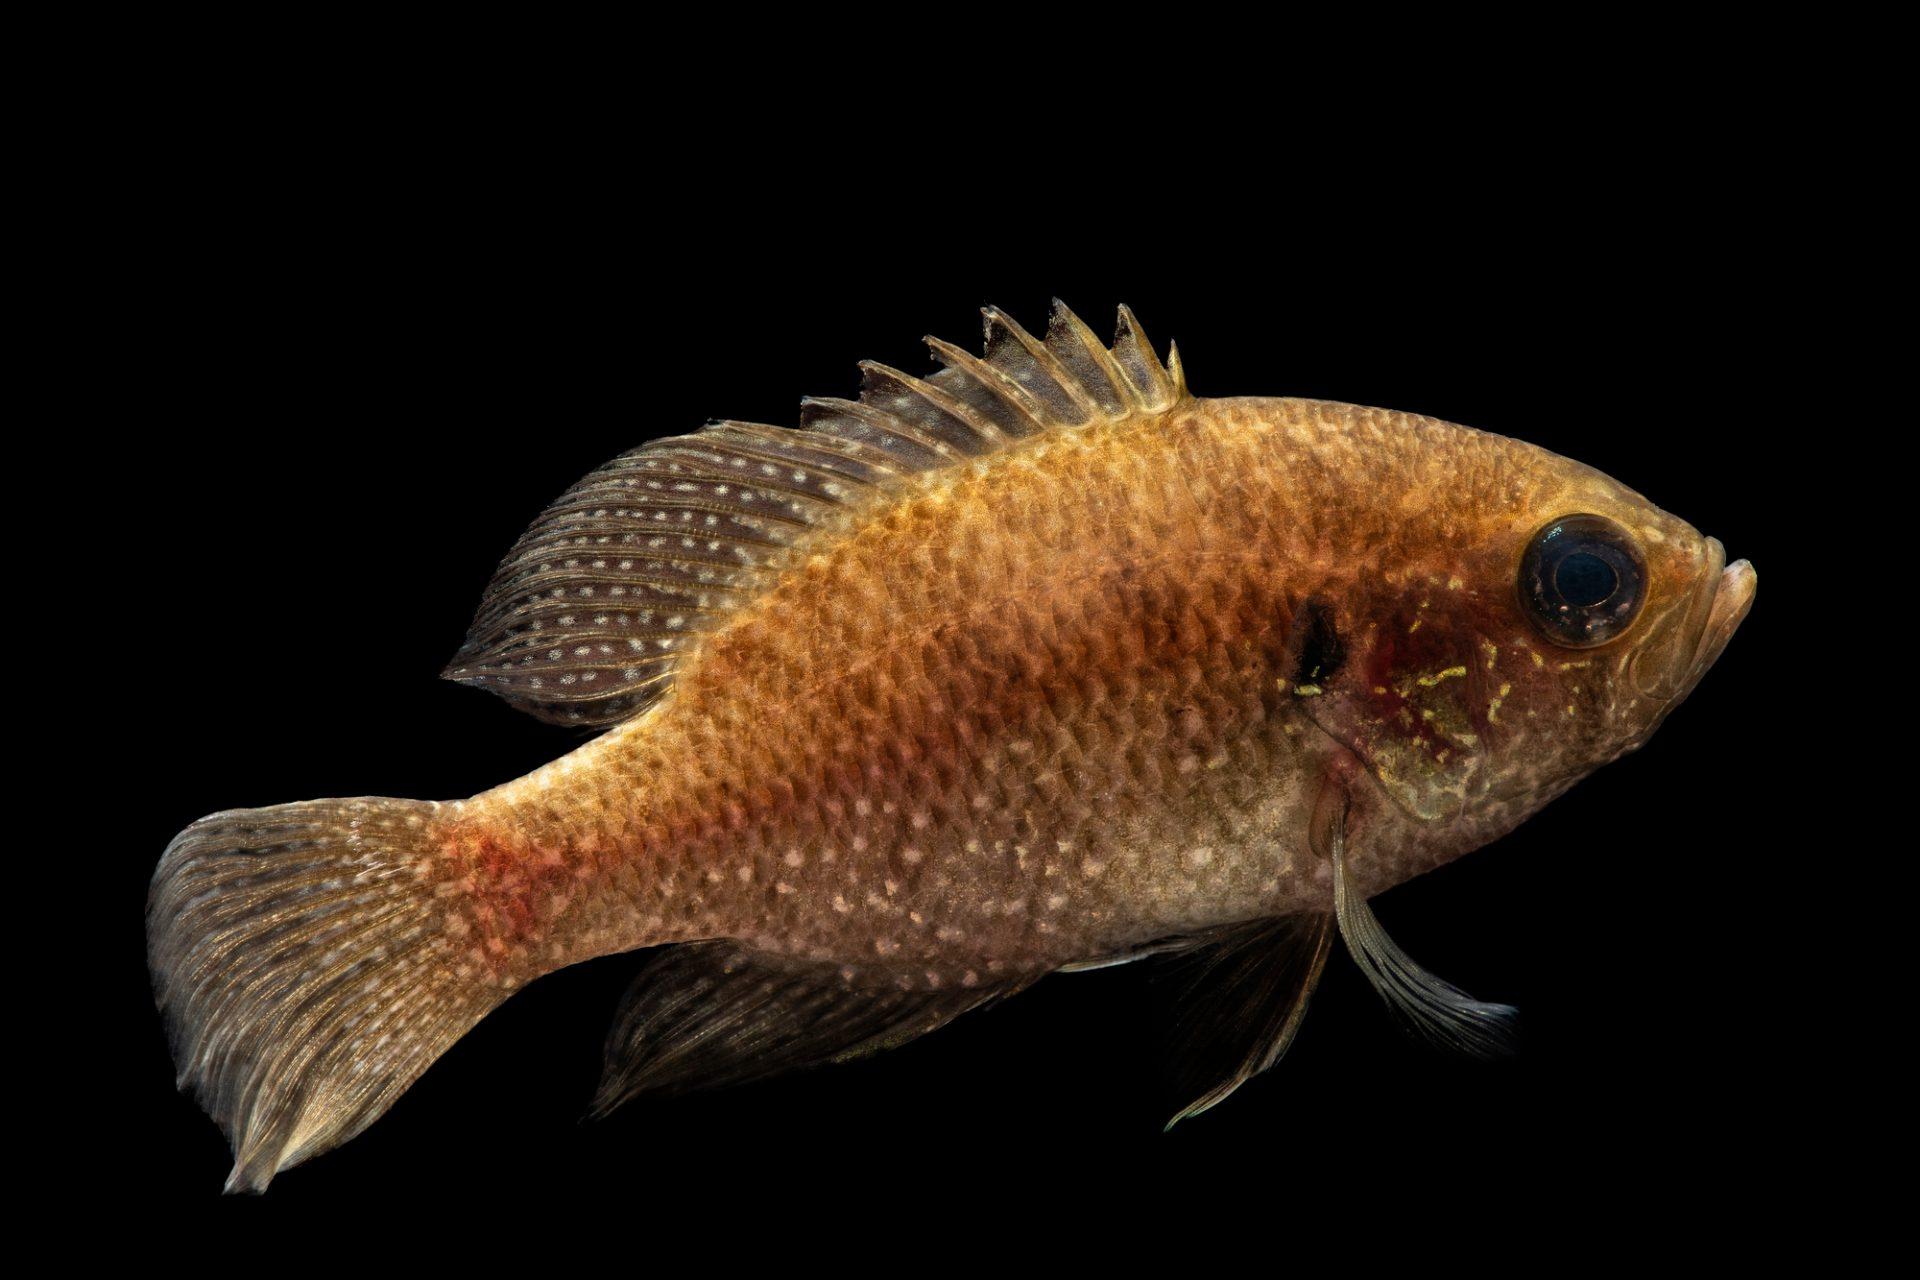 Photo: A bluespotted sunfish (Enneacanthus gloriosus) Fish Biodiversity Lab, at Auburn University, Auburn, Alabama.